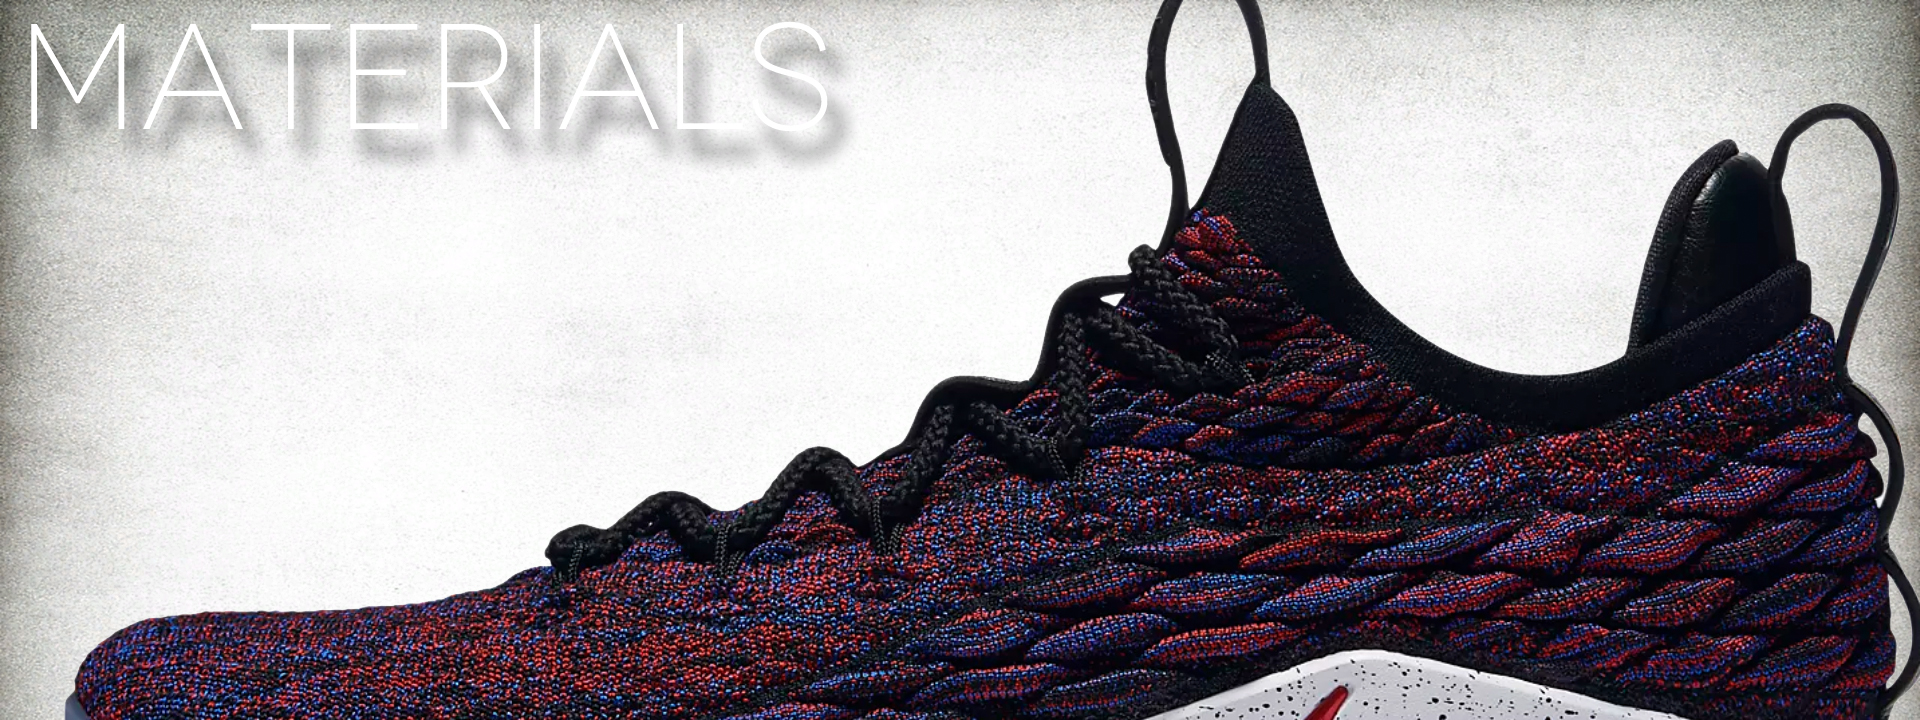 Nike LeBron 15 Low Performance Review Duke4005 materials